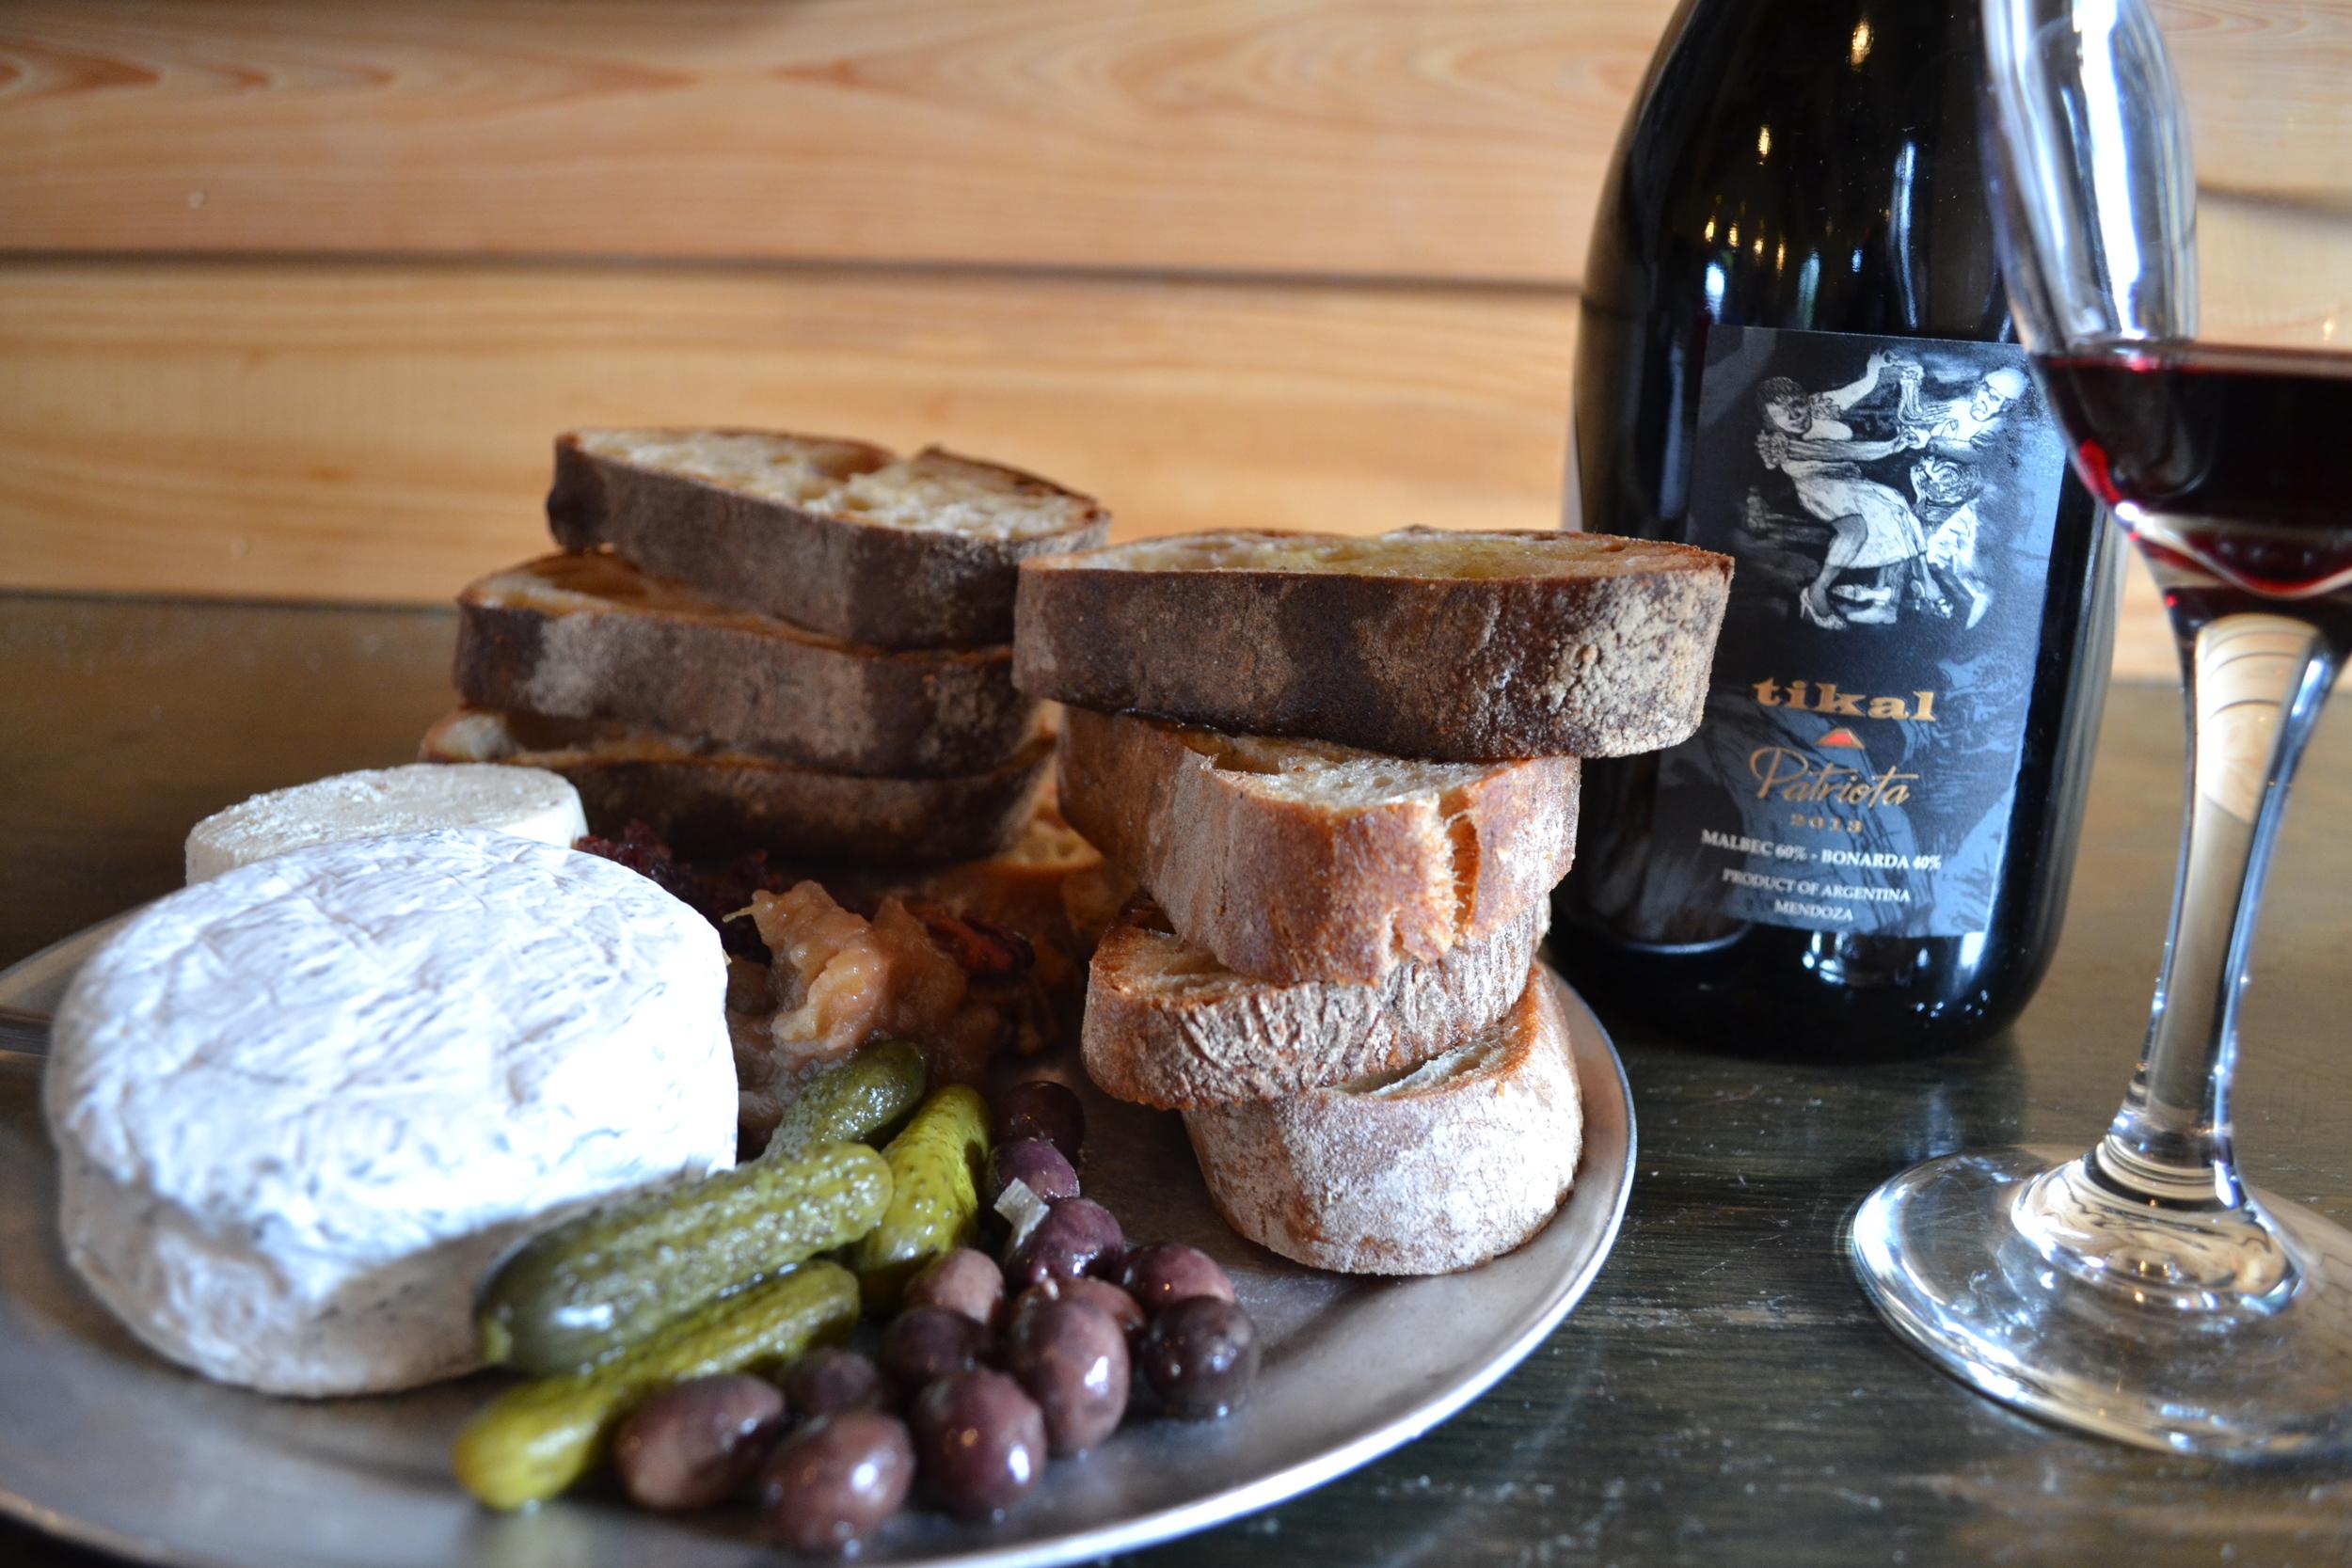 Beautiful Cheeses and Wine at Bacchanal